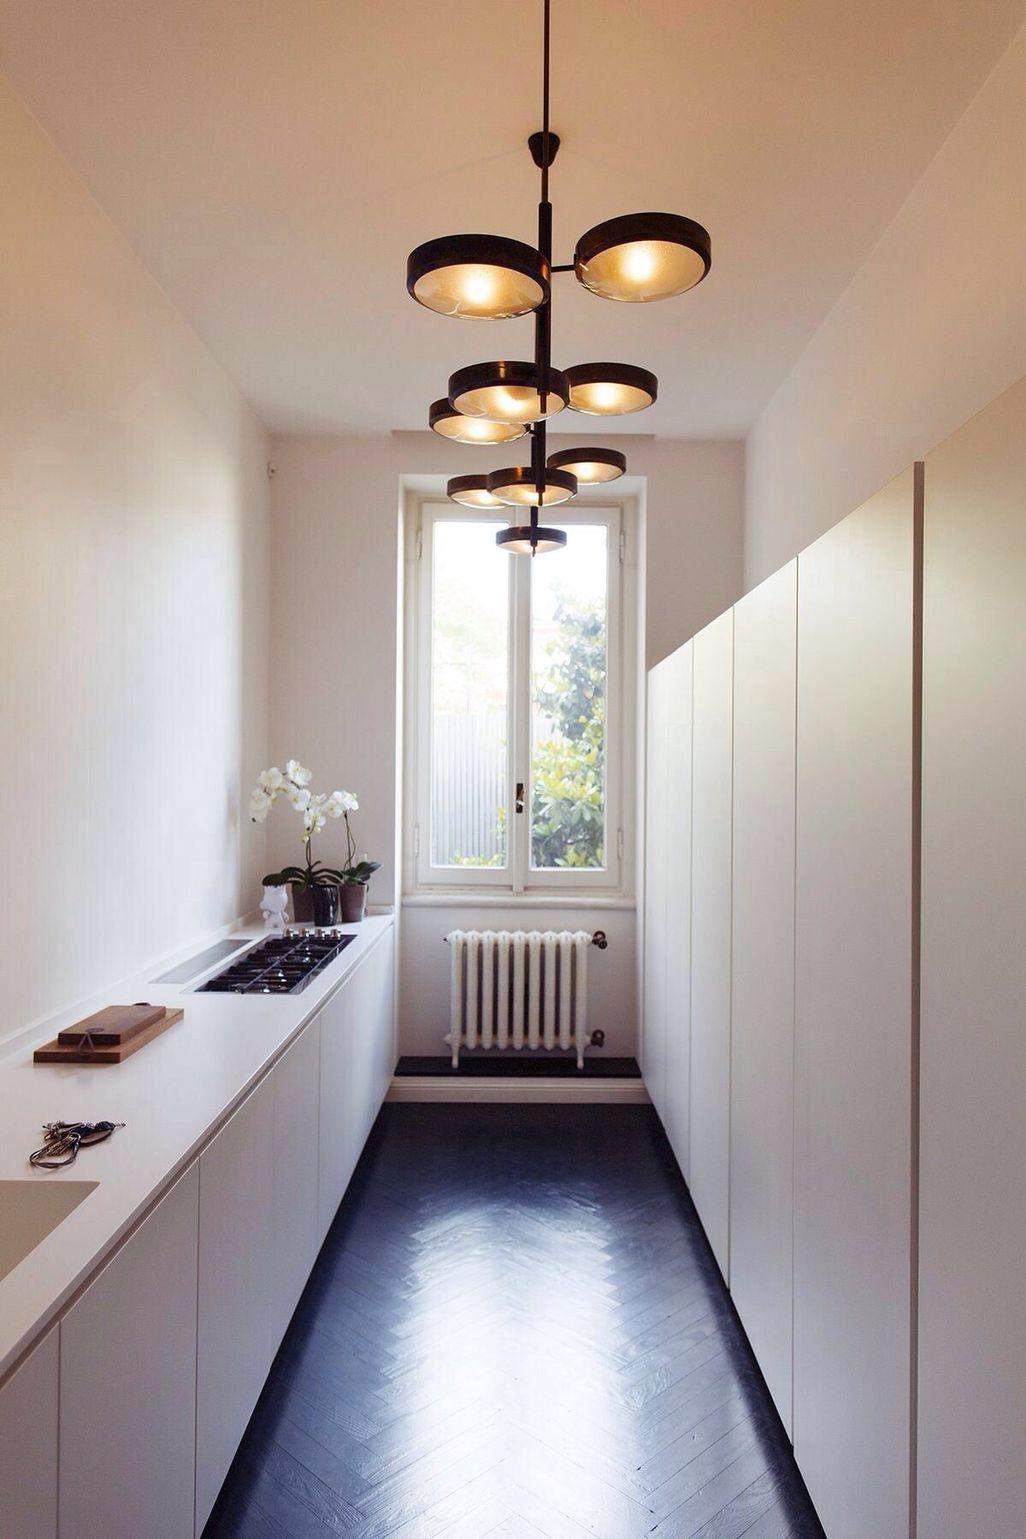 Modern And Minimalist Kitchen Decoration Ideas 15